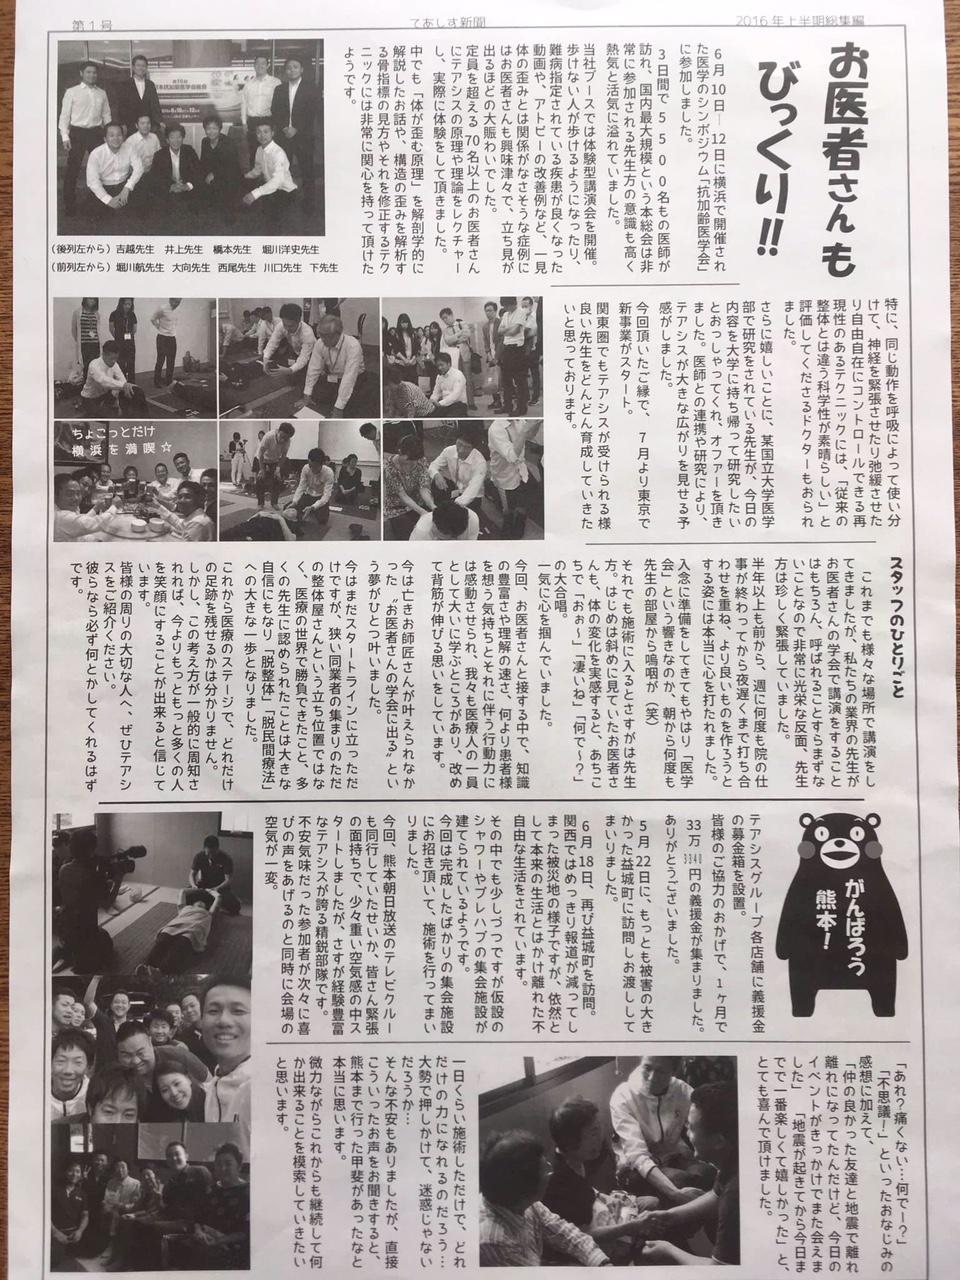 teashis shinbun (2).JPG